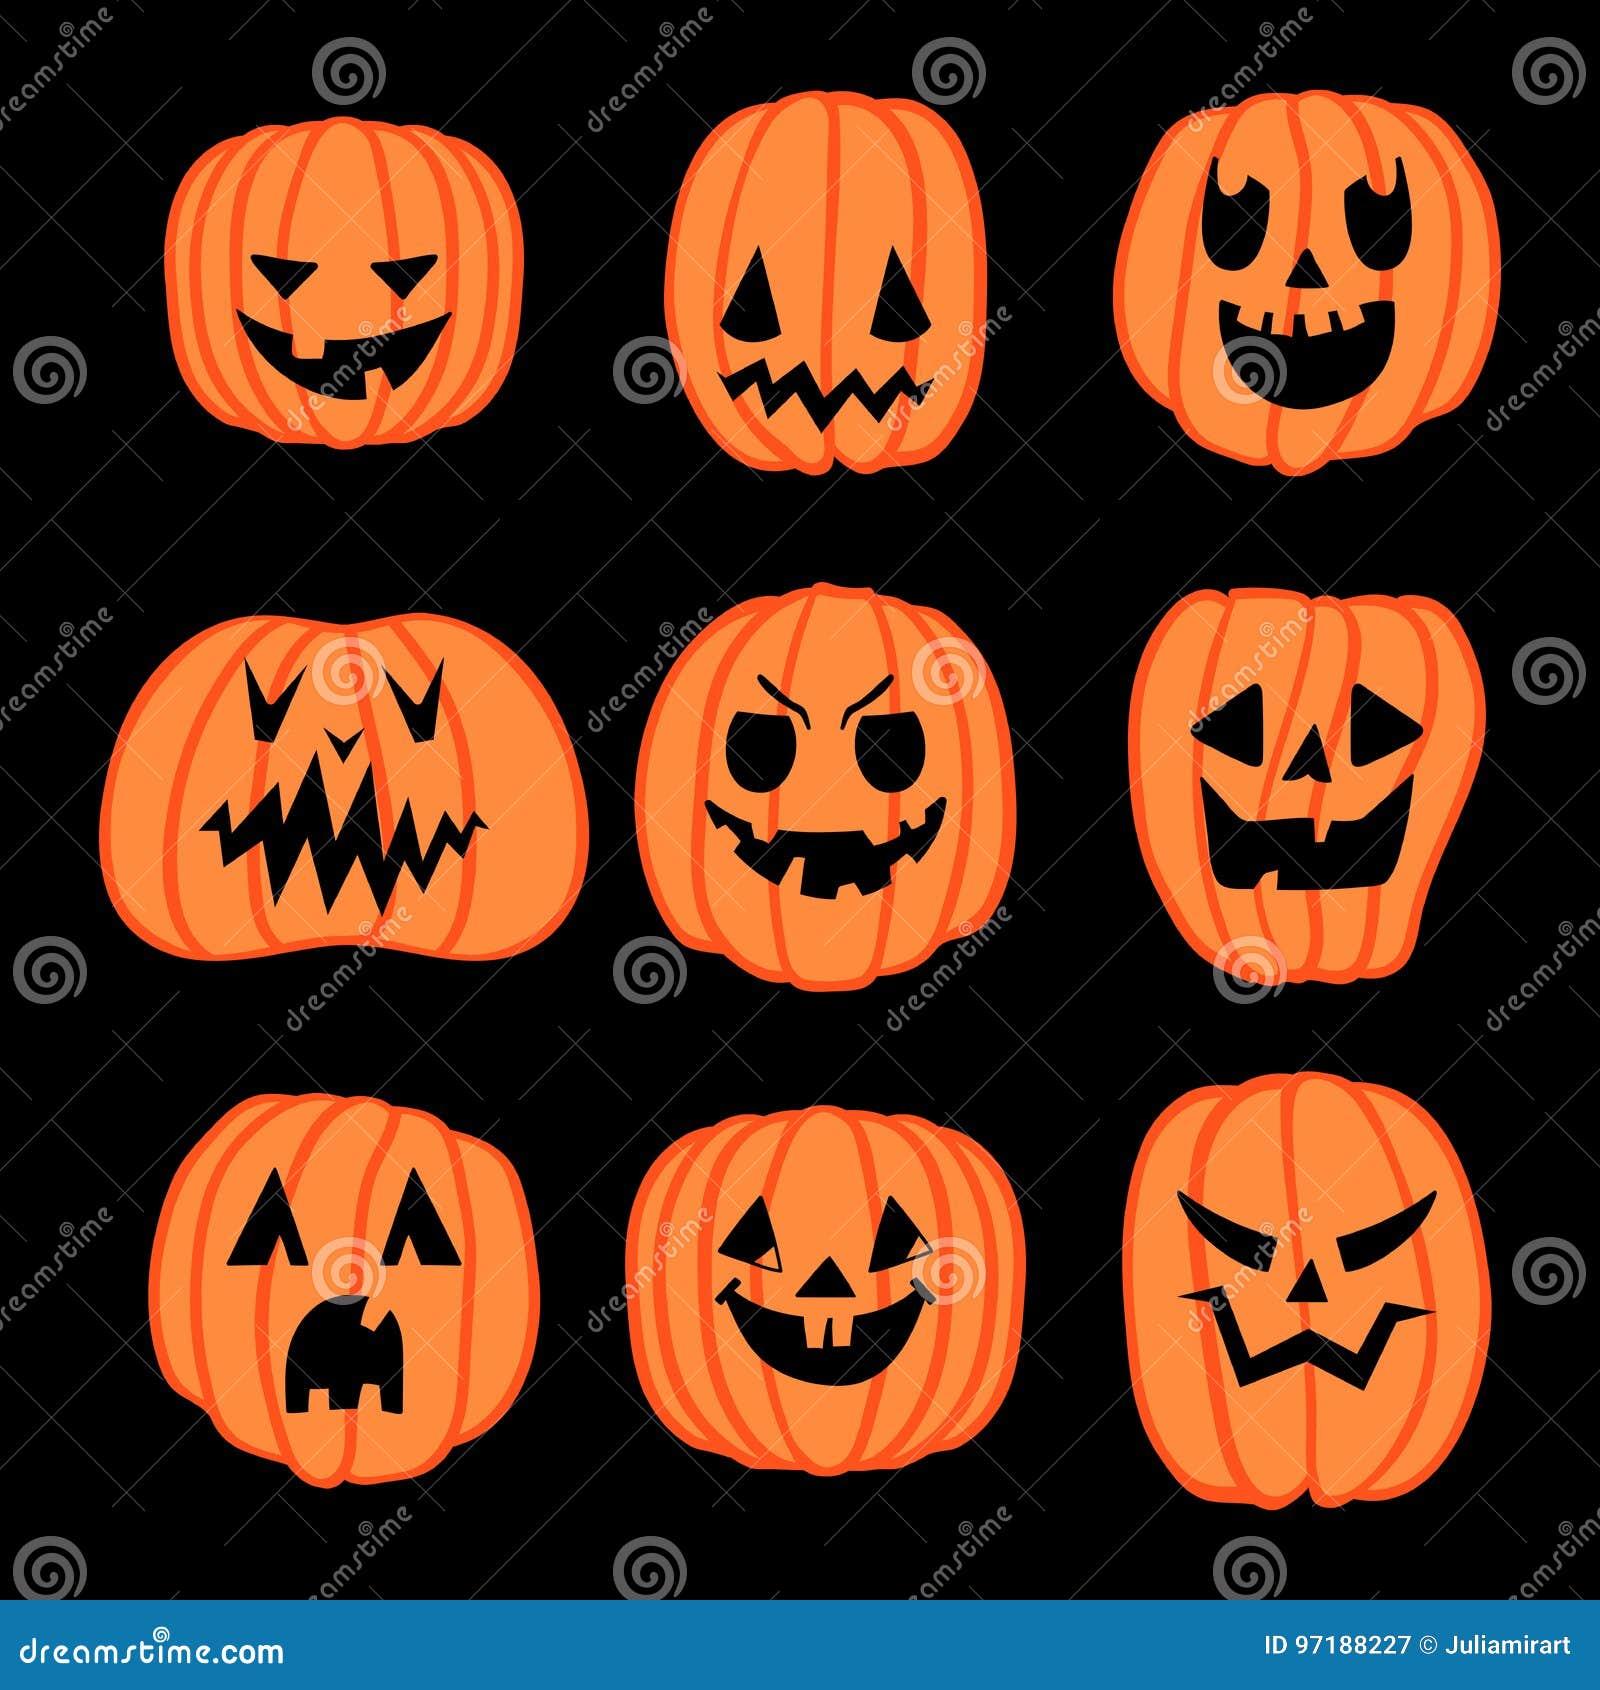 Aboboras De Halloween Ajustadas Ilustracao Do Vetor Ilustracao De Halloween Aboboras 97188227